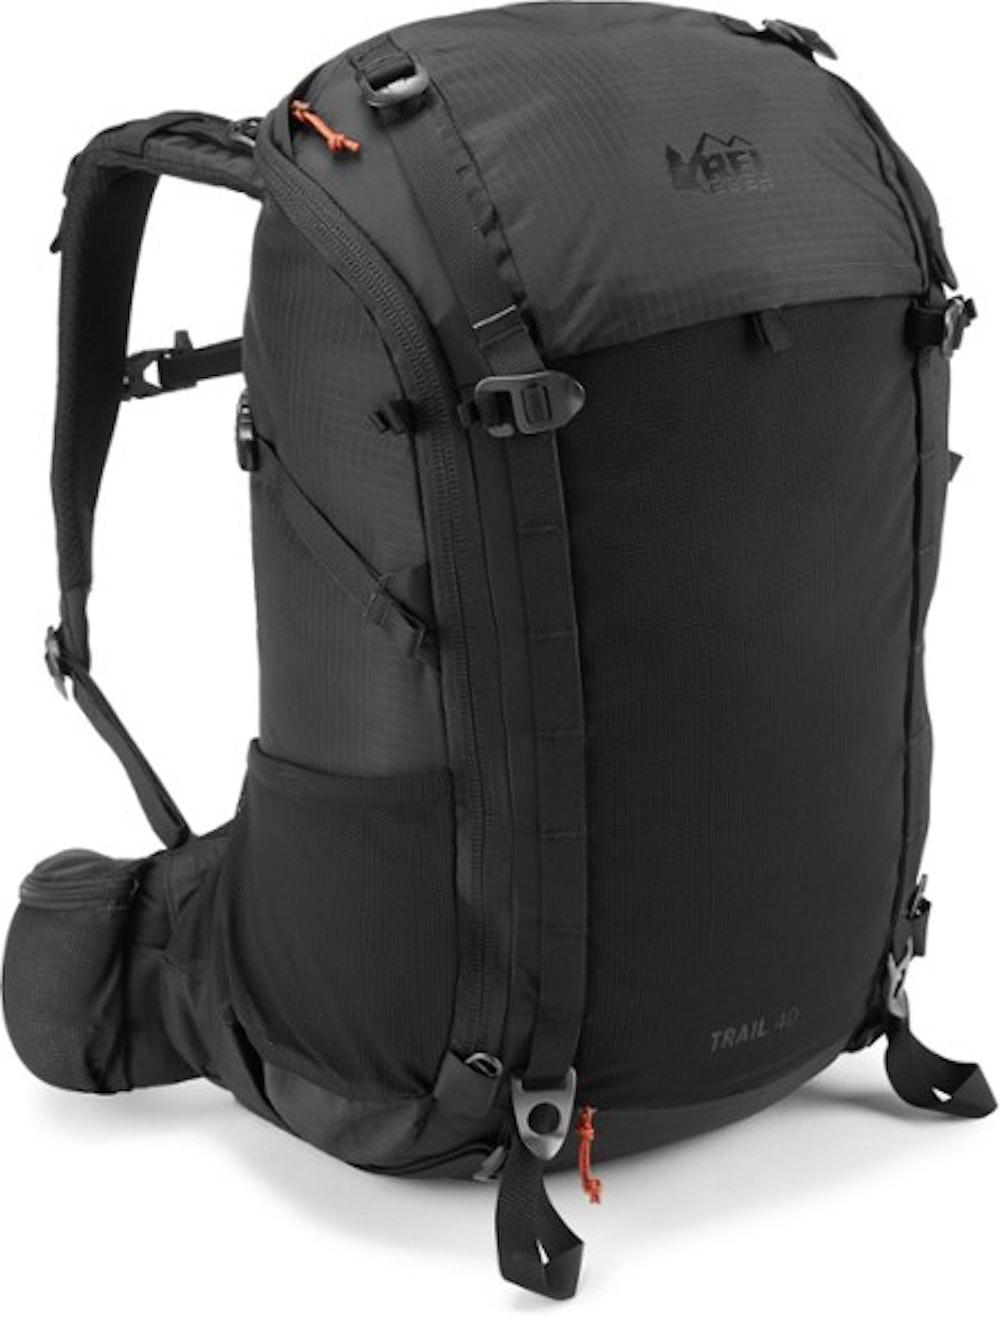 Trail 40 Pack